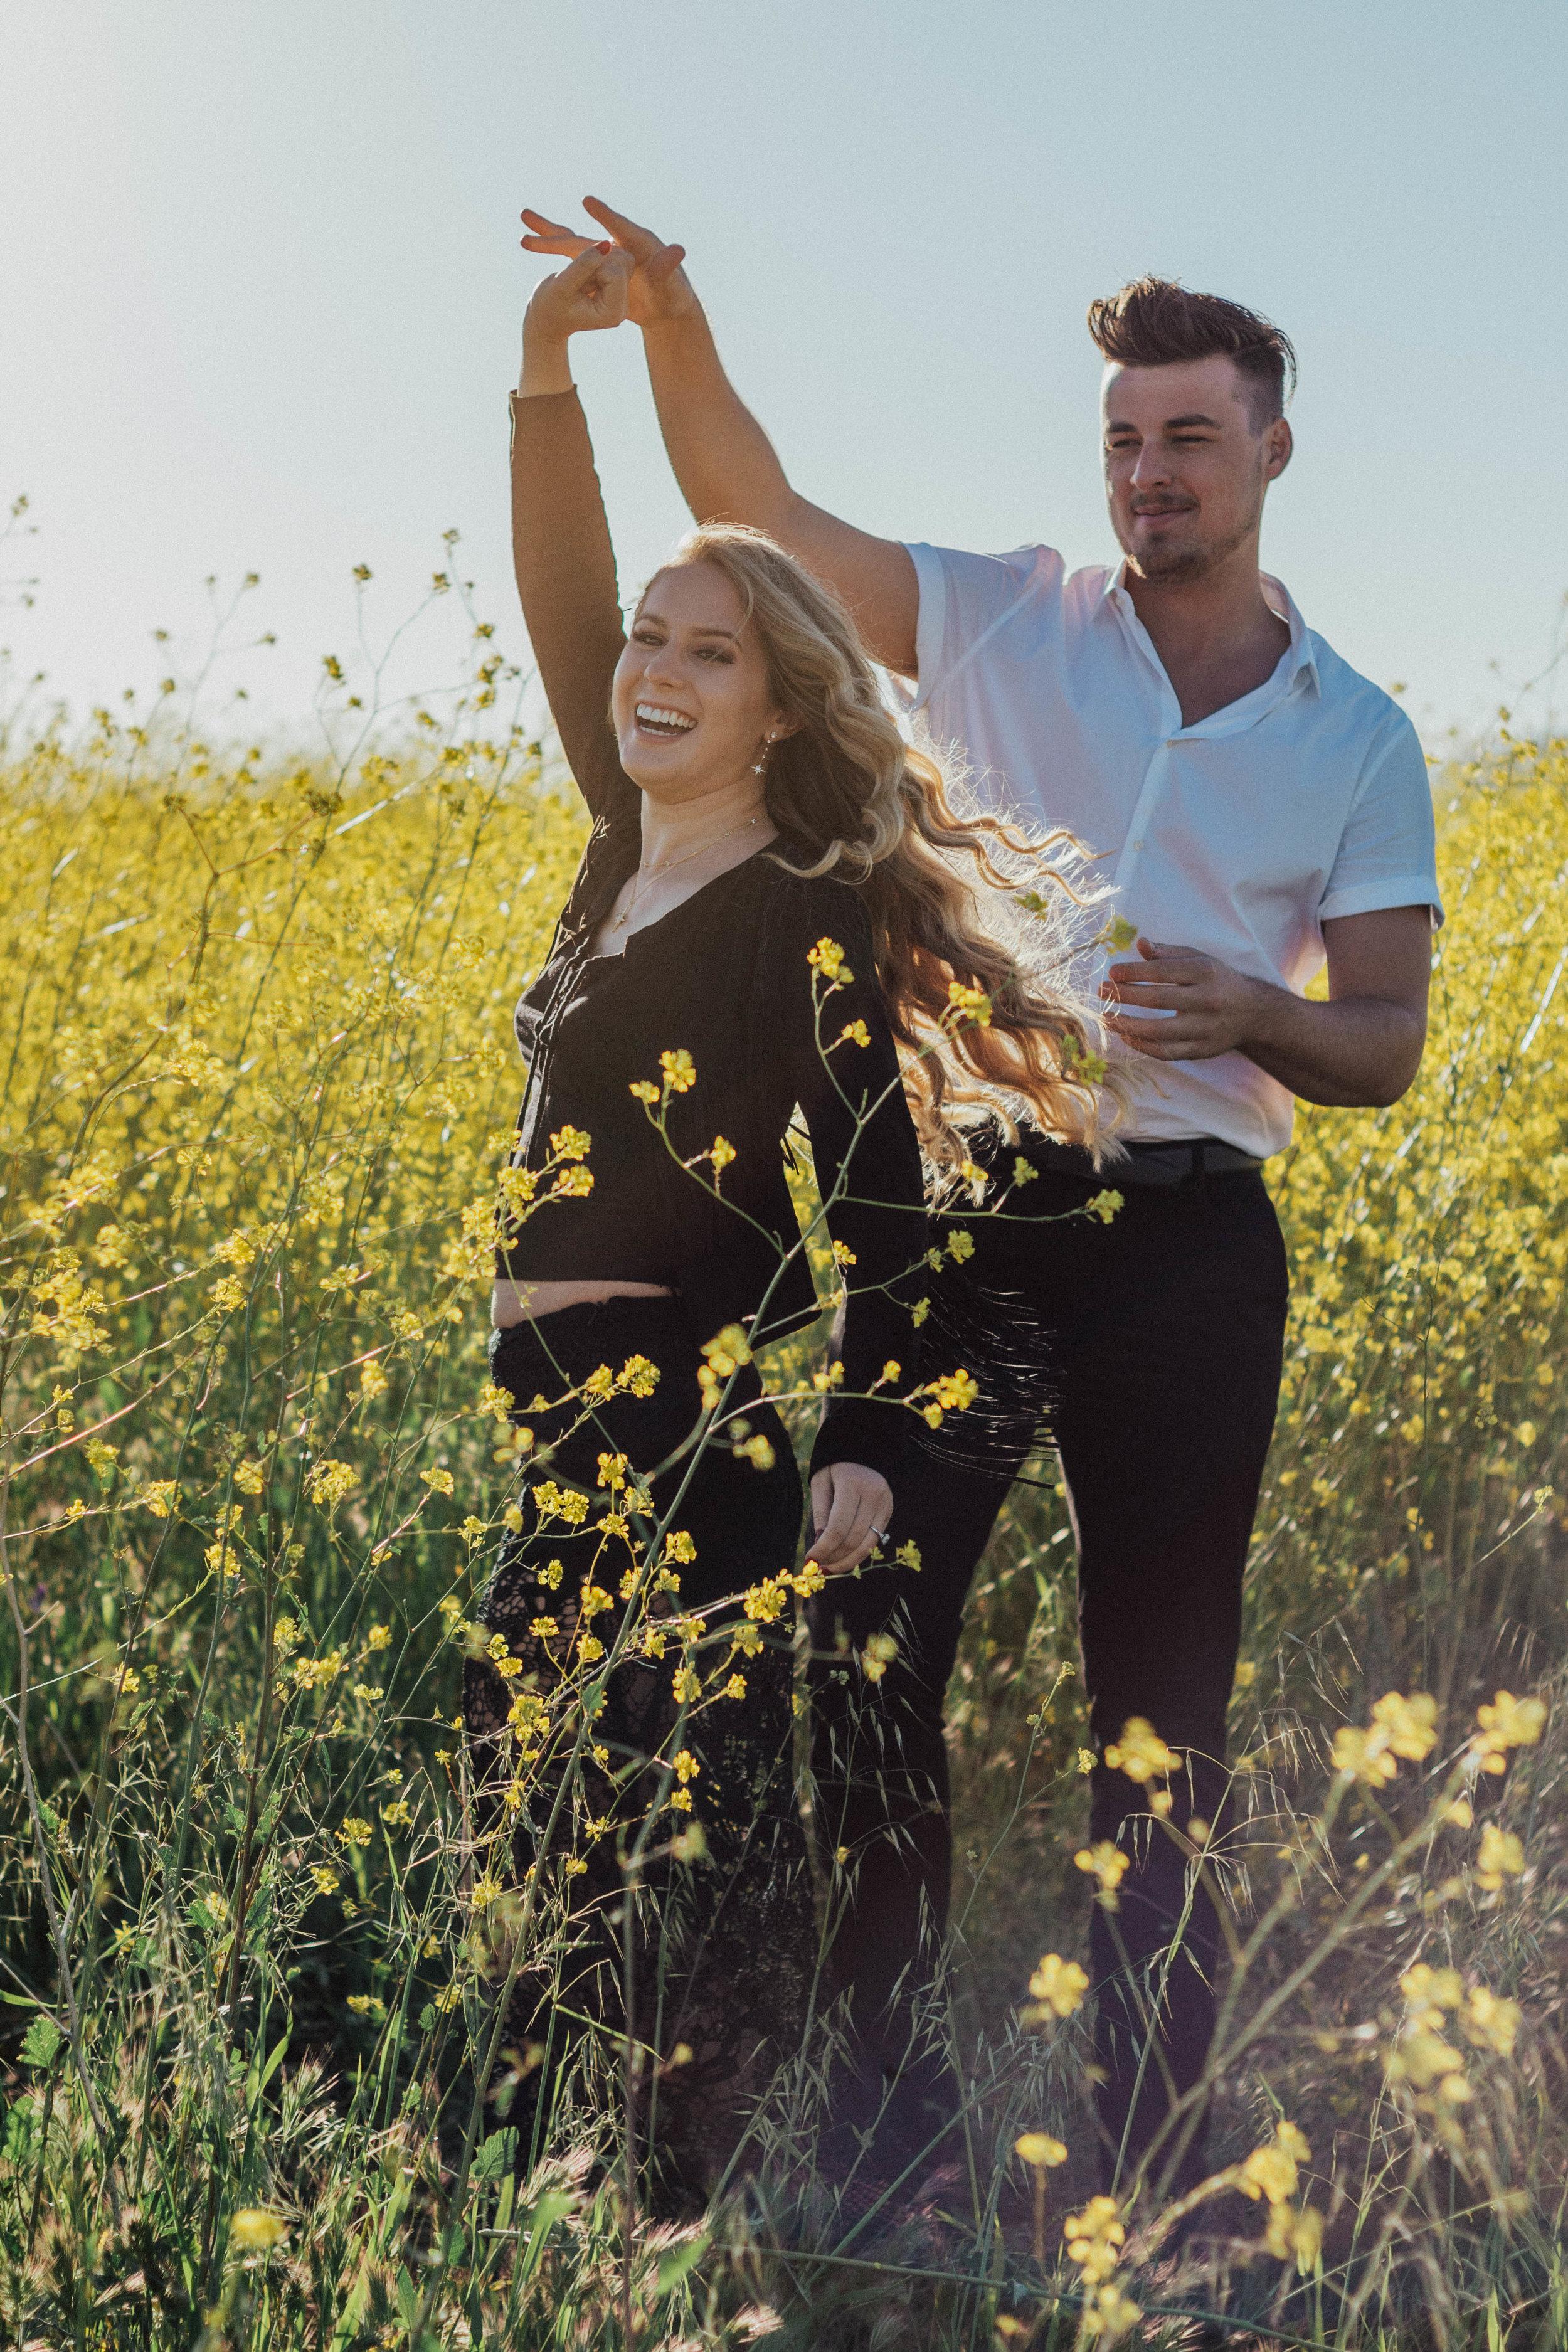 Ana Rose ana rose and harrison sedona engagements — hillary lacy